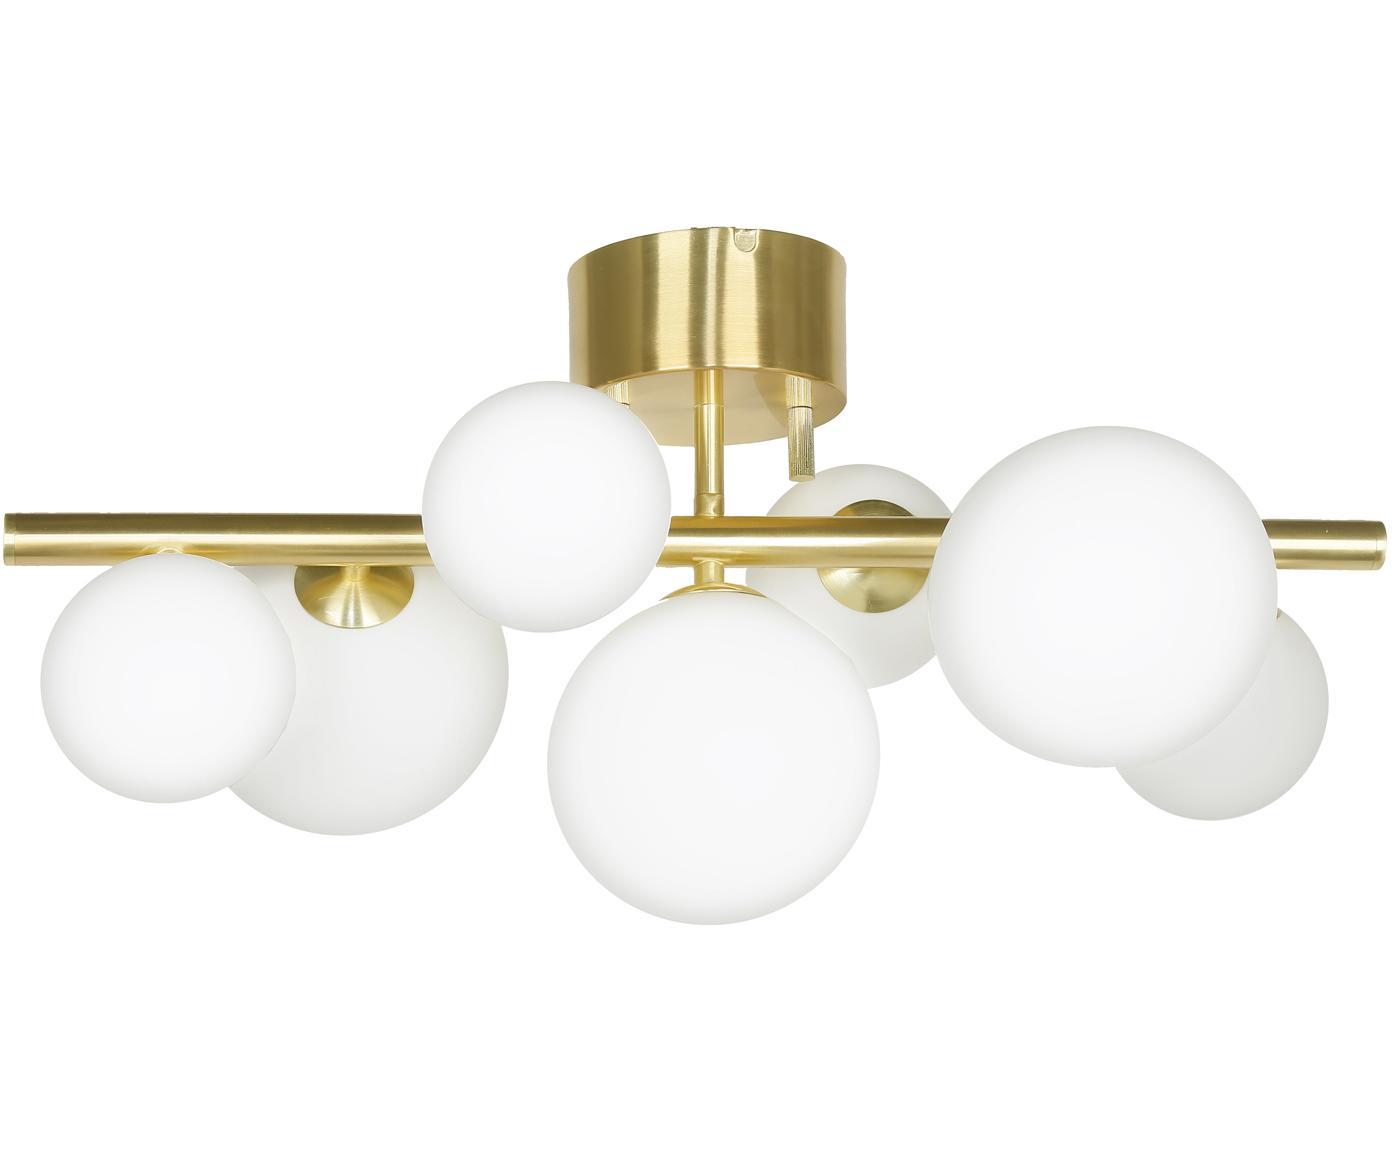 Plafondlamp Molekyl, Messing, opaalglas, Messingkleurig, opaalwit, 58 x 30 cm